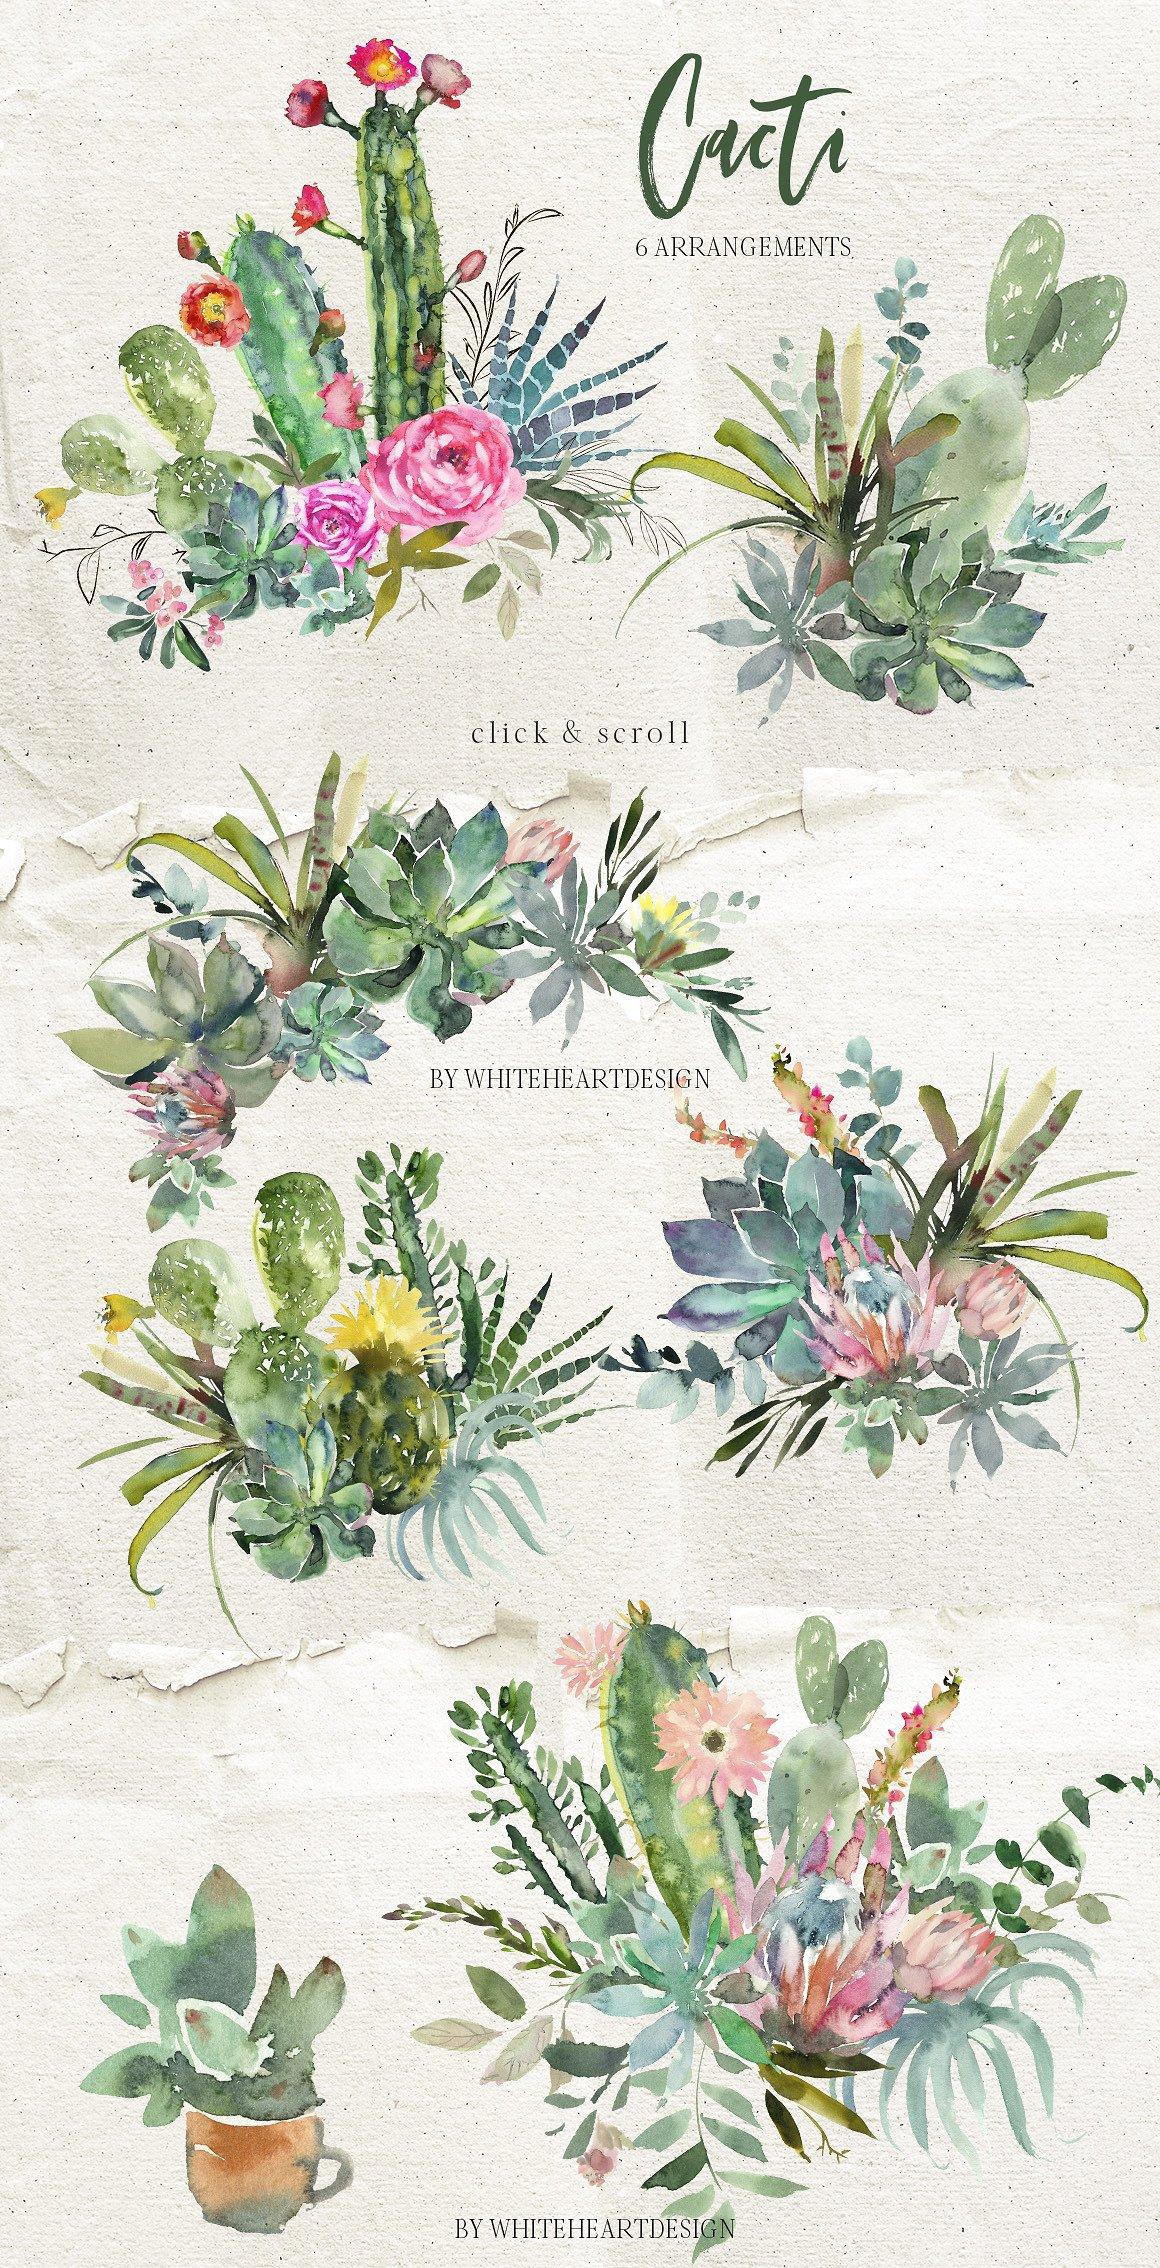 cact-watercolor-floral-succulent-clipart-.jpg